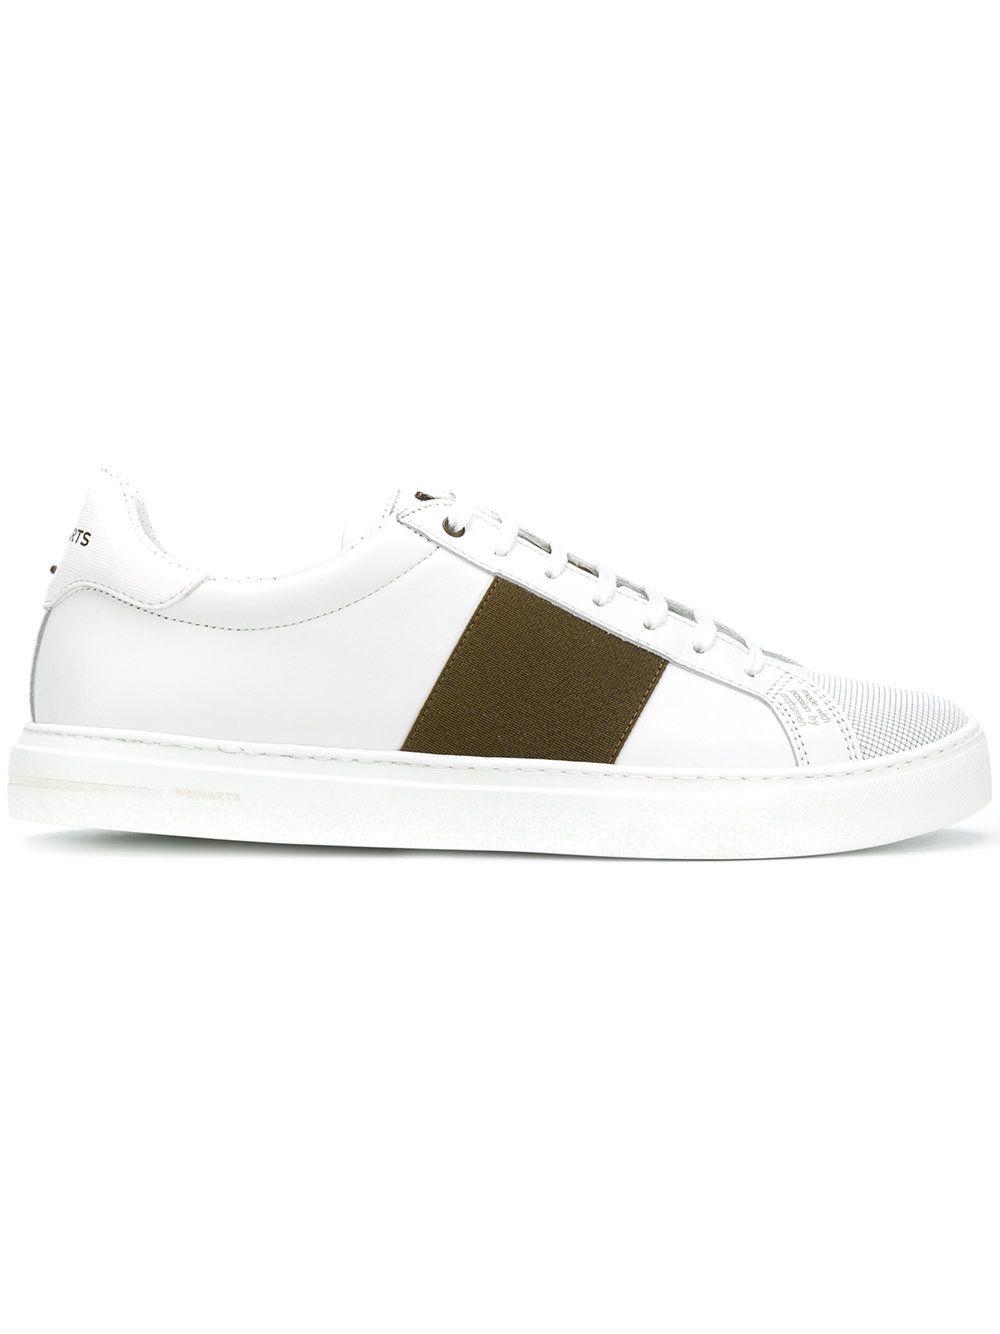 contrast low-top sneakers - White Brimarts JMJdSvKW